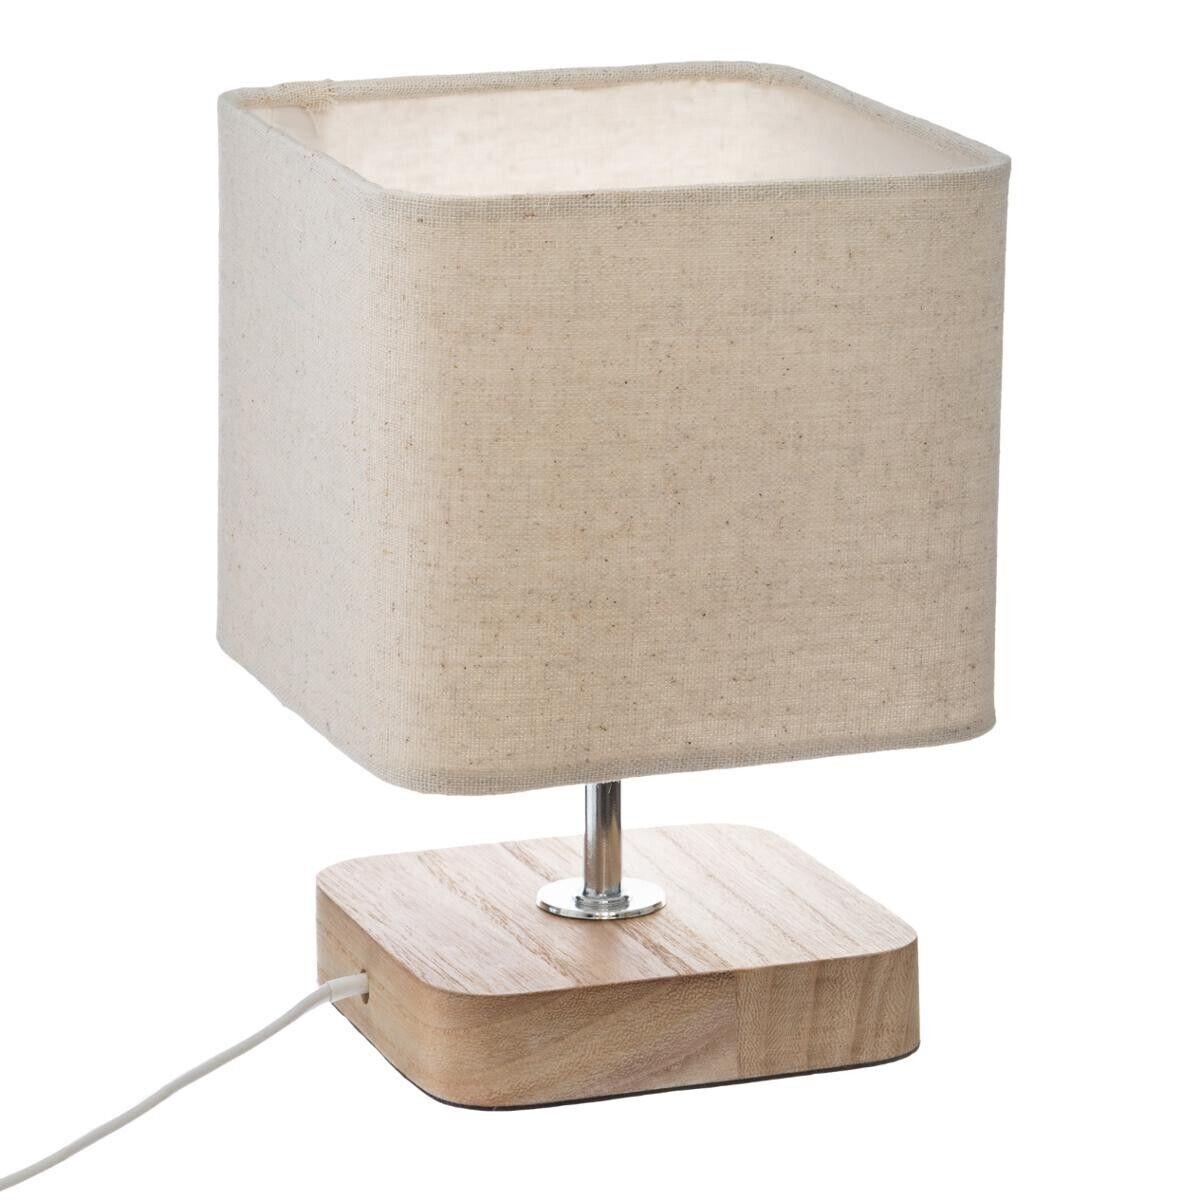 "Atmosphera Lampe à poser ""Toxey"" en bois H21"